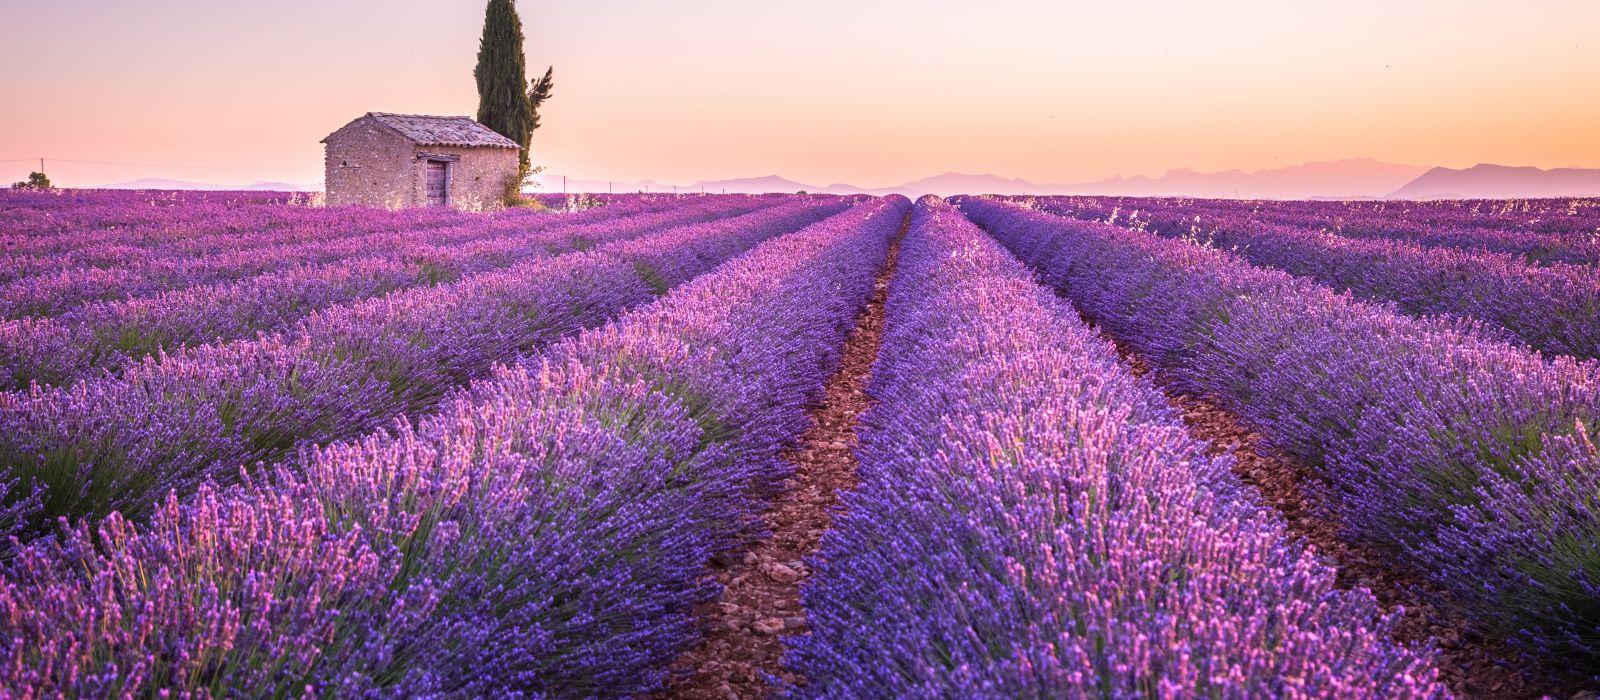 Destination Provence Region France